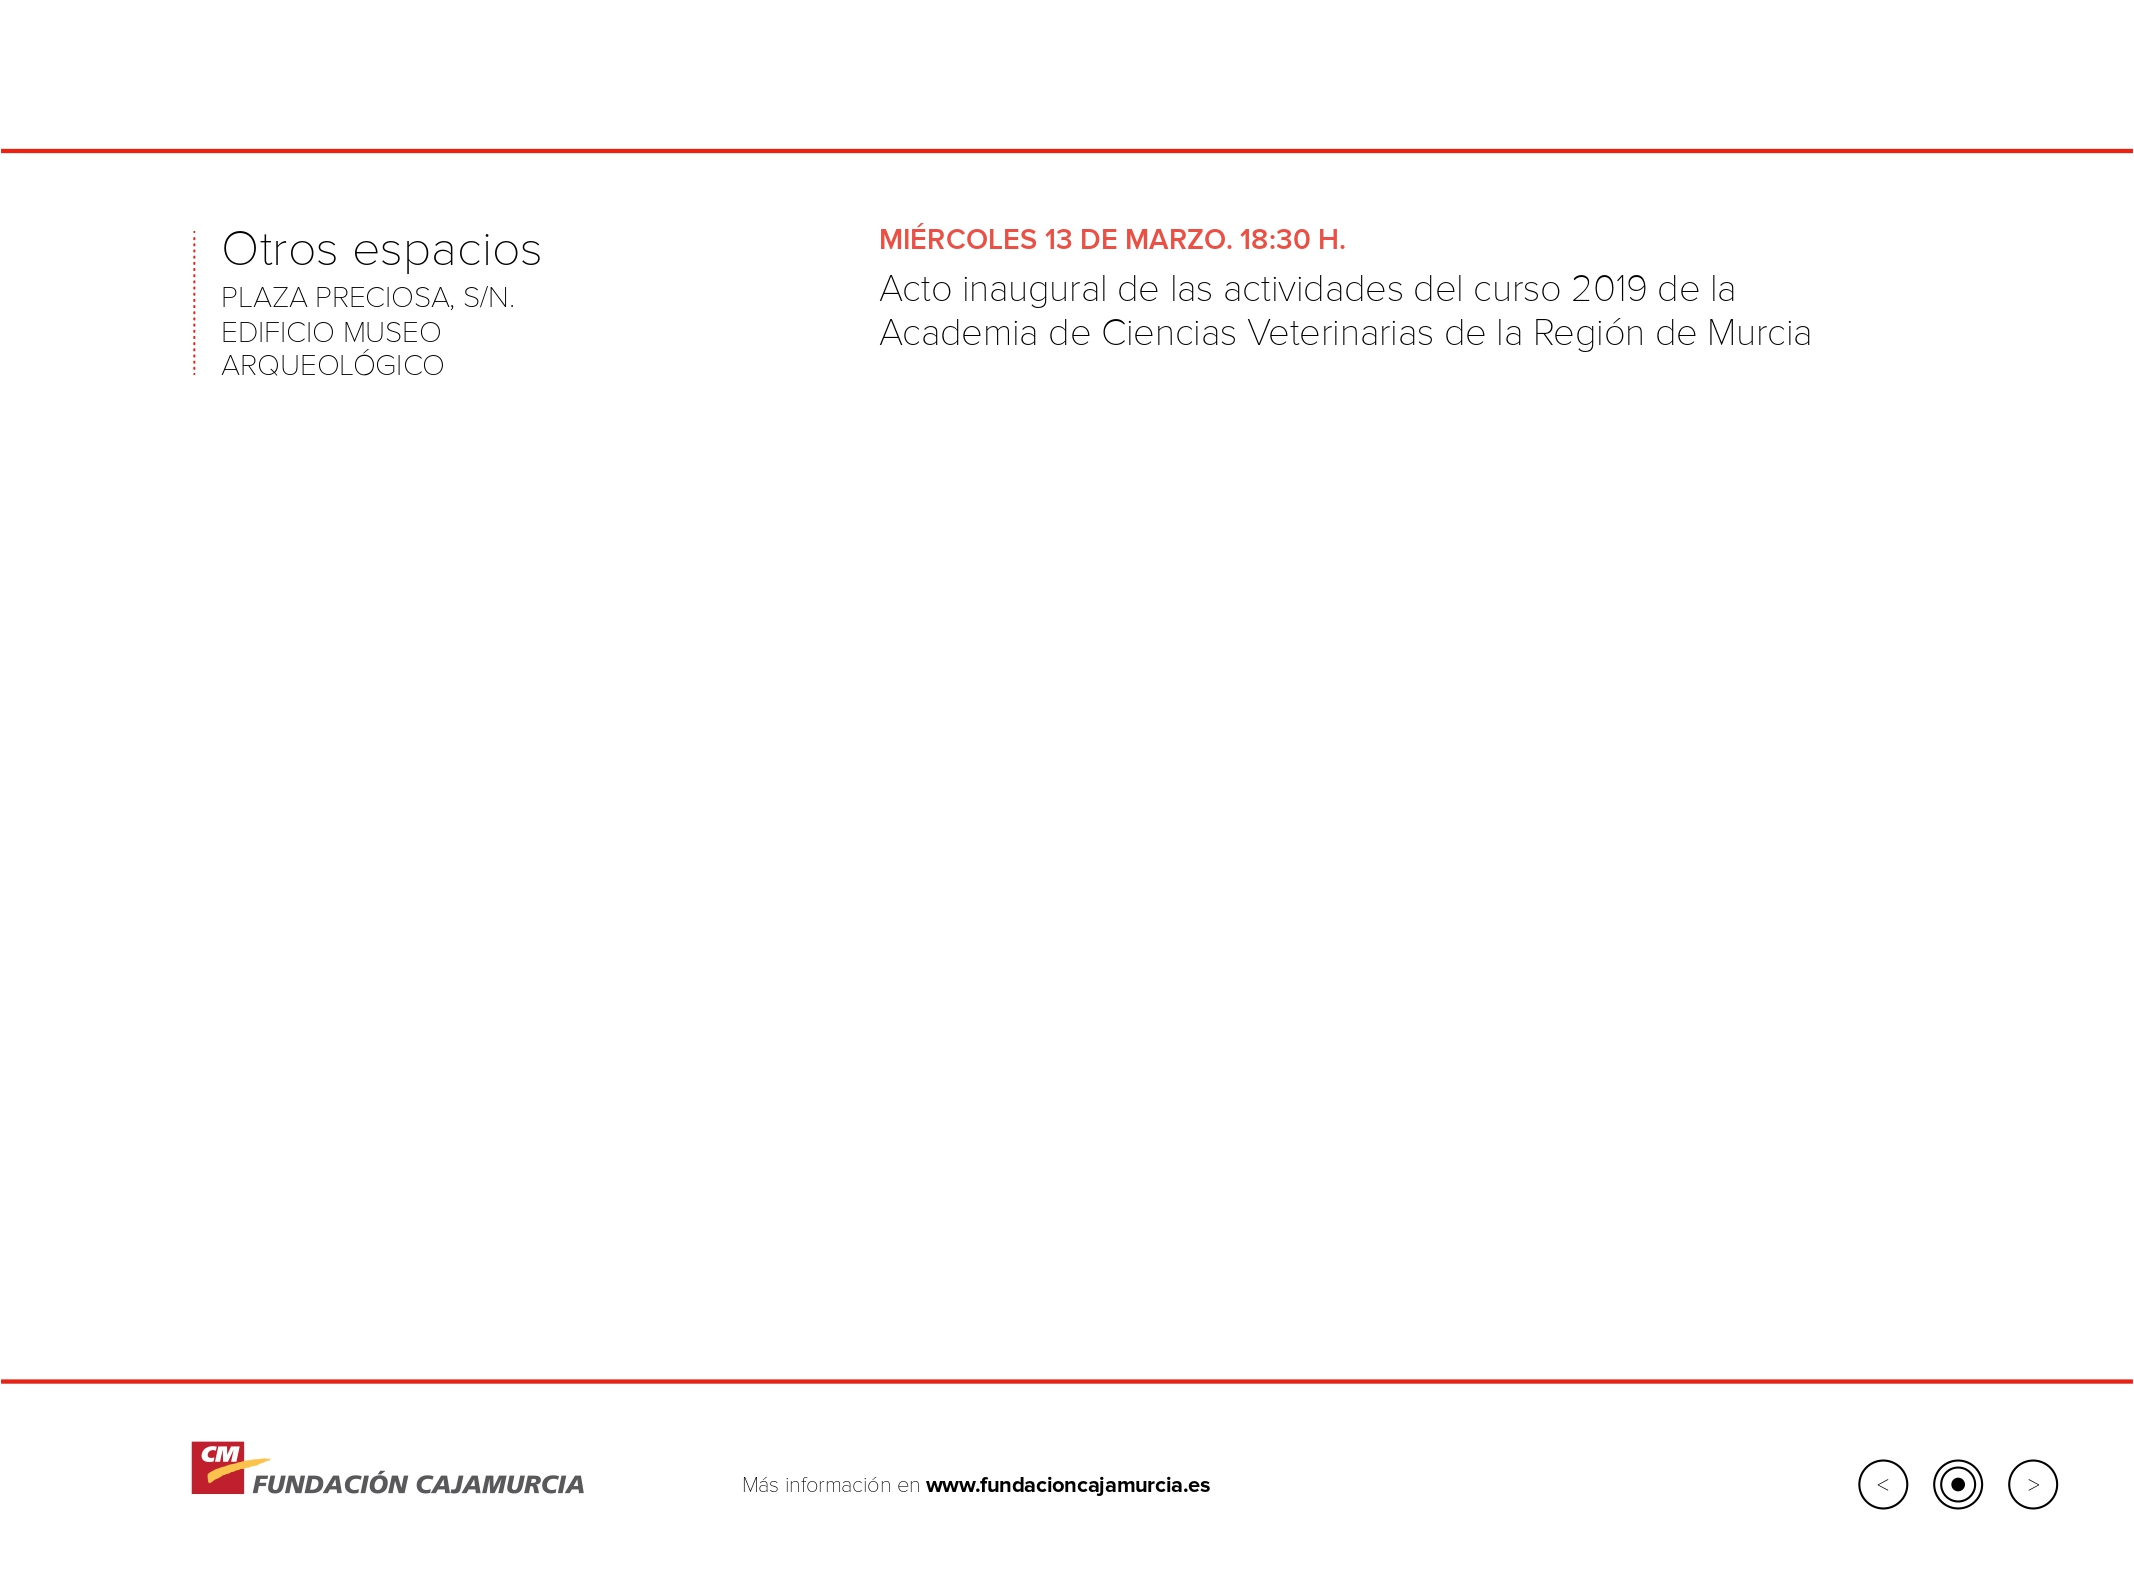 agenda-cajamurcia_page-0012.jpg